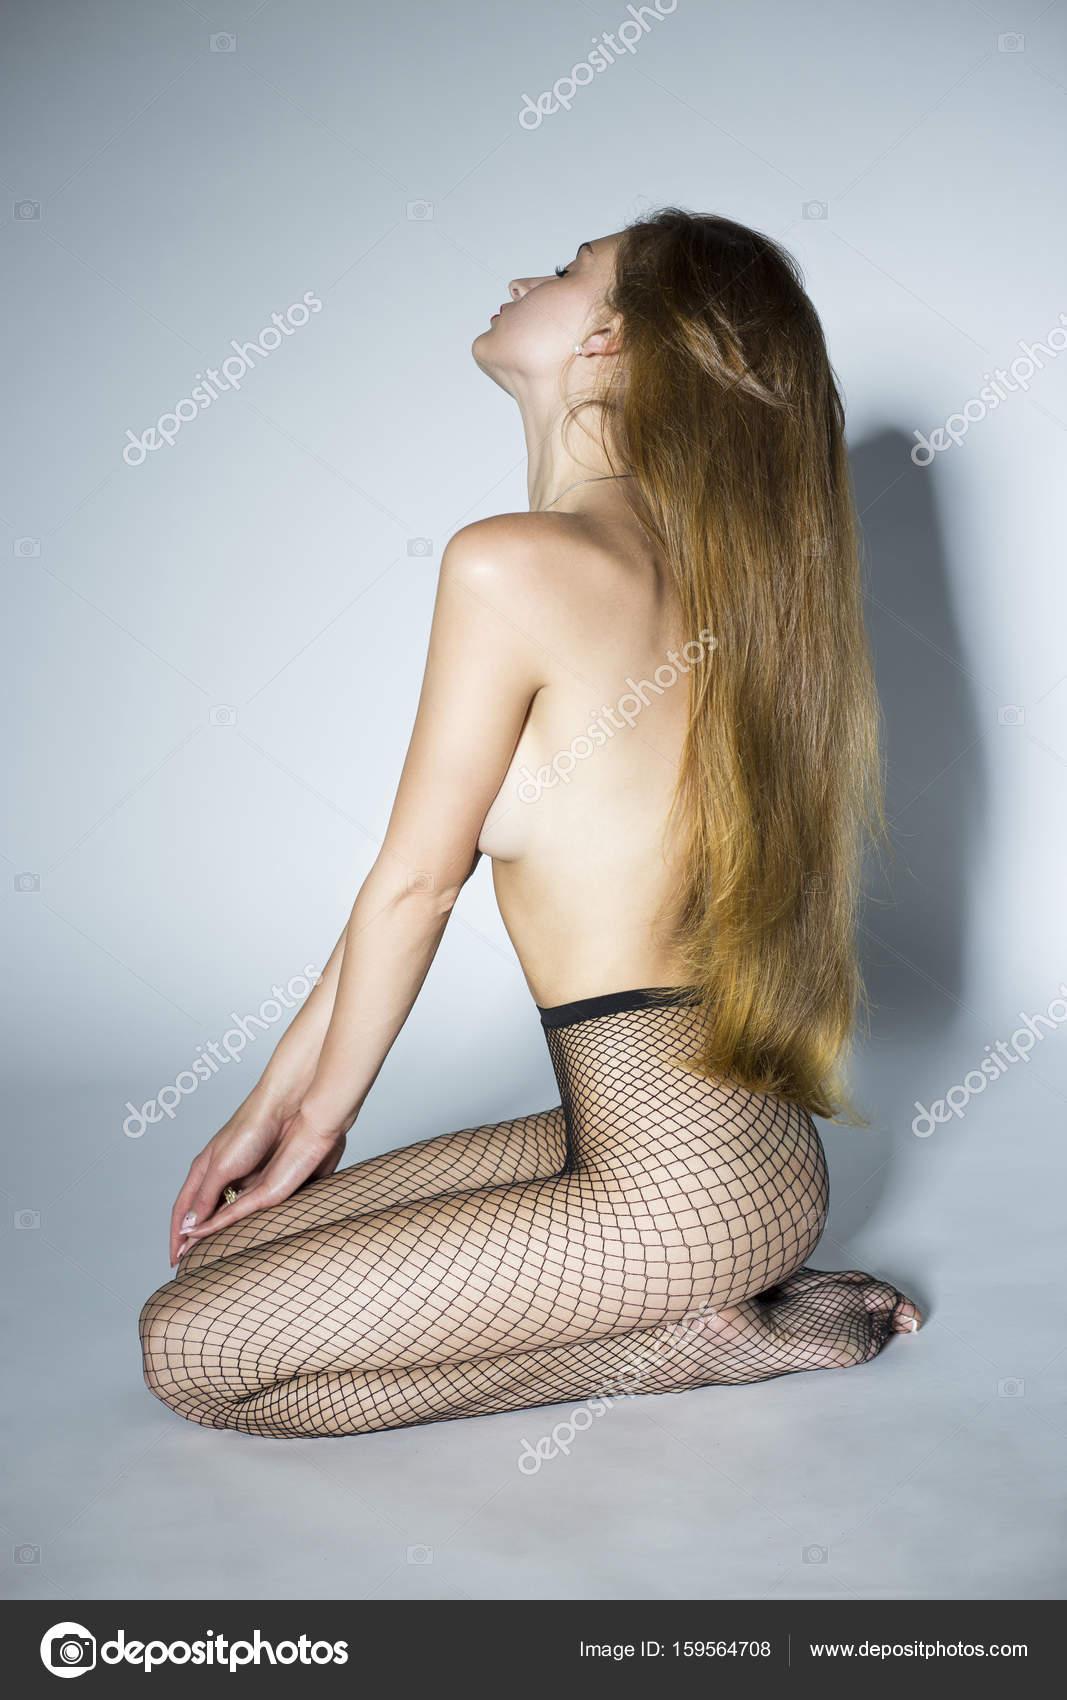 foto-seksi-v-kolgotkah-setku